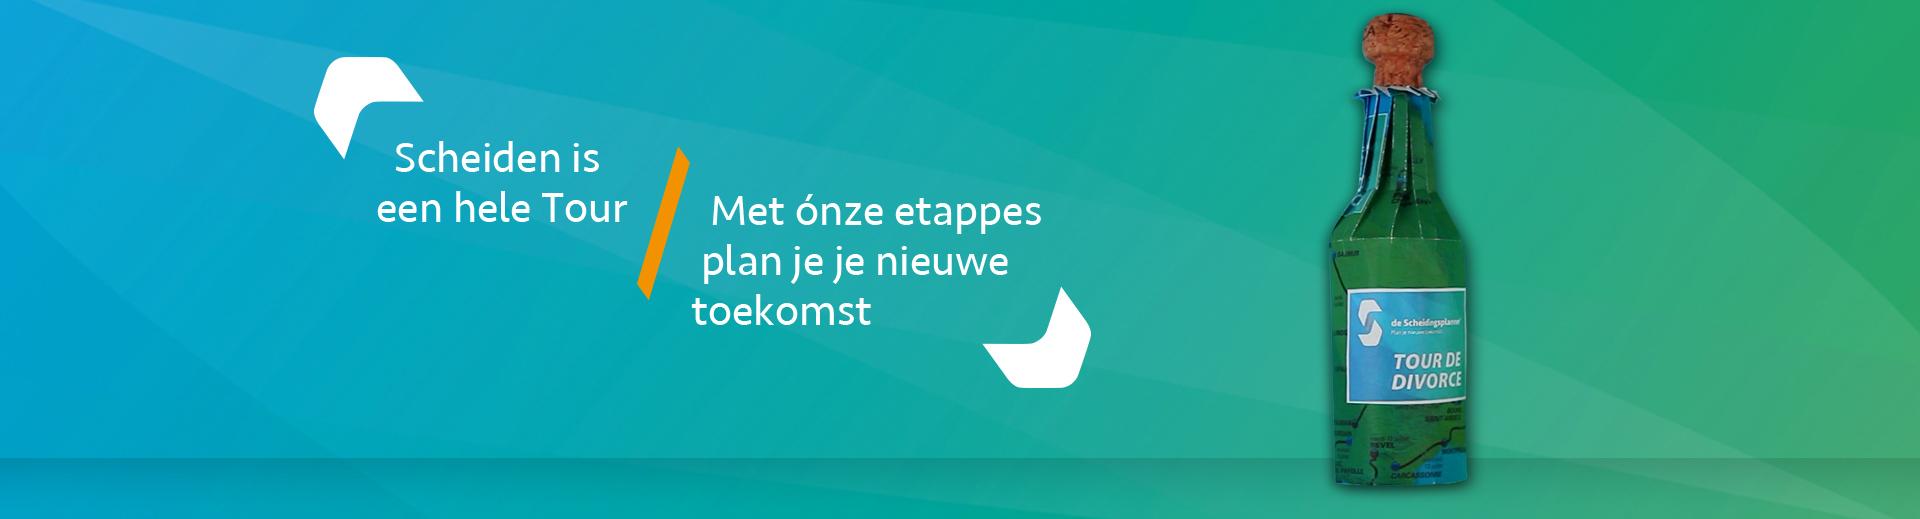 Volg onze Tour de Divorce - Scheidingsplanner Almelo | Deventer | Nijverdal